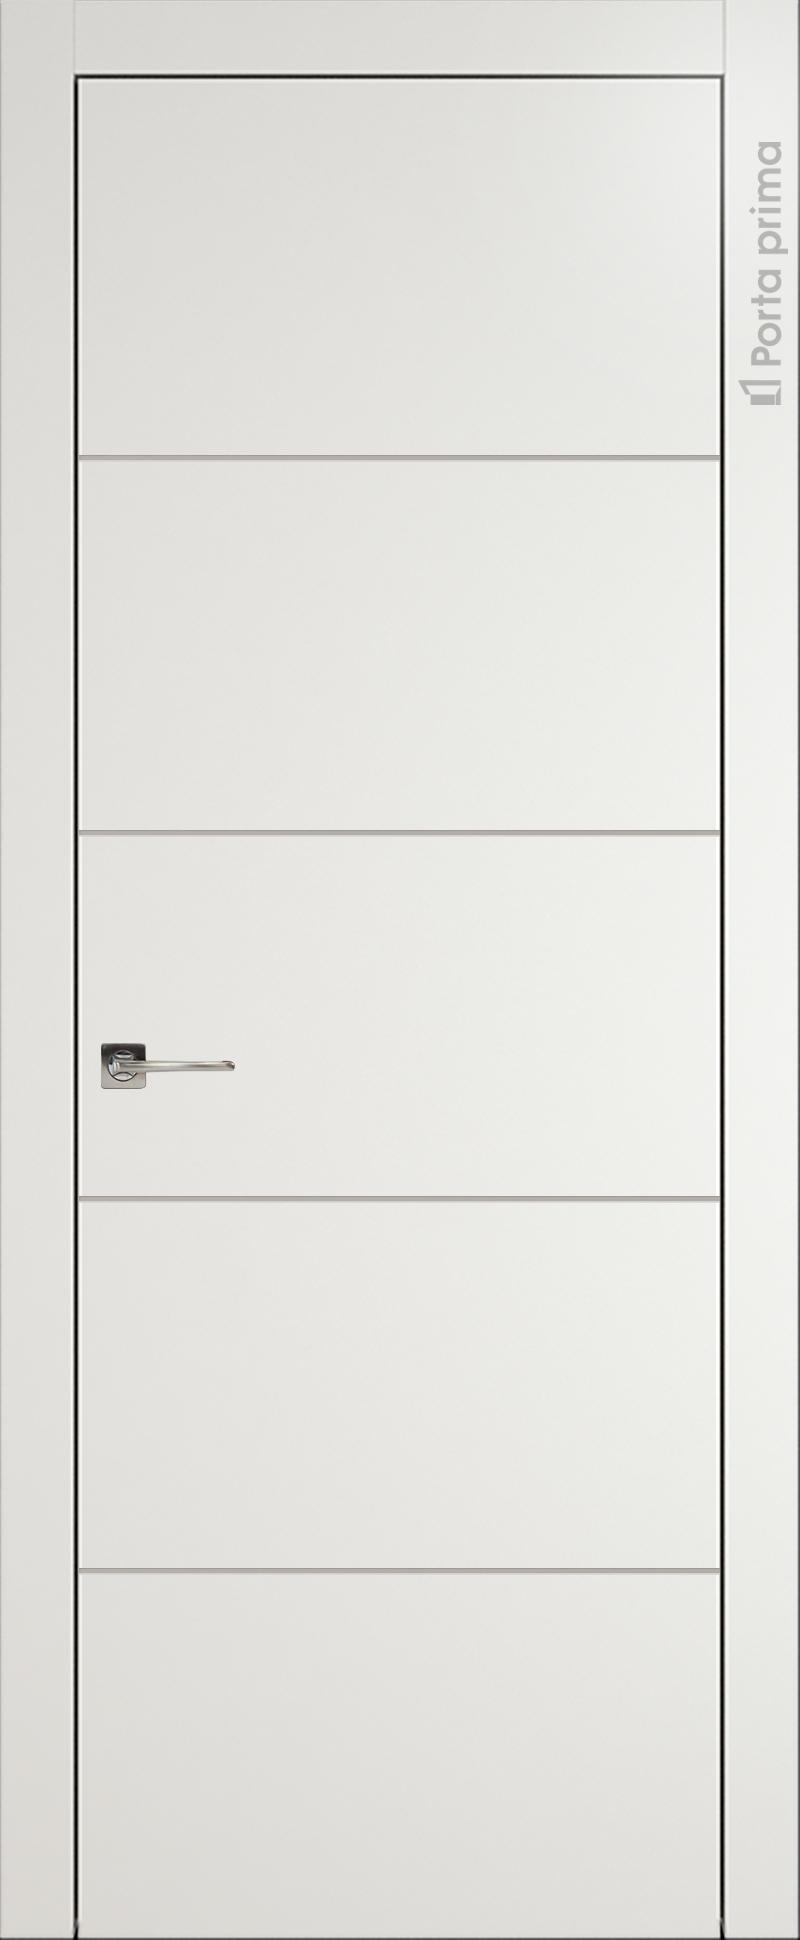 Tivoli Д-2 цвет - Бежевая эмаль (RAL 9010) Без стекла (ДГ)